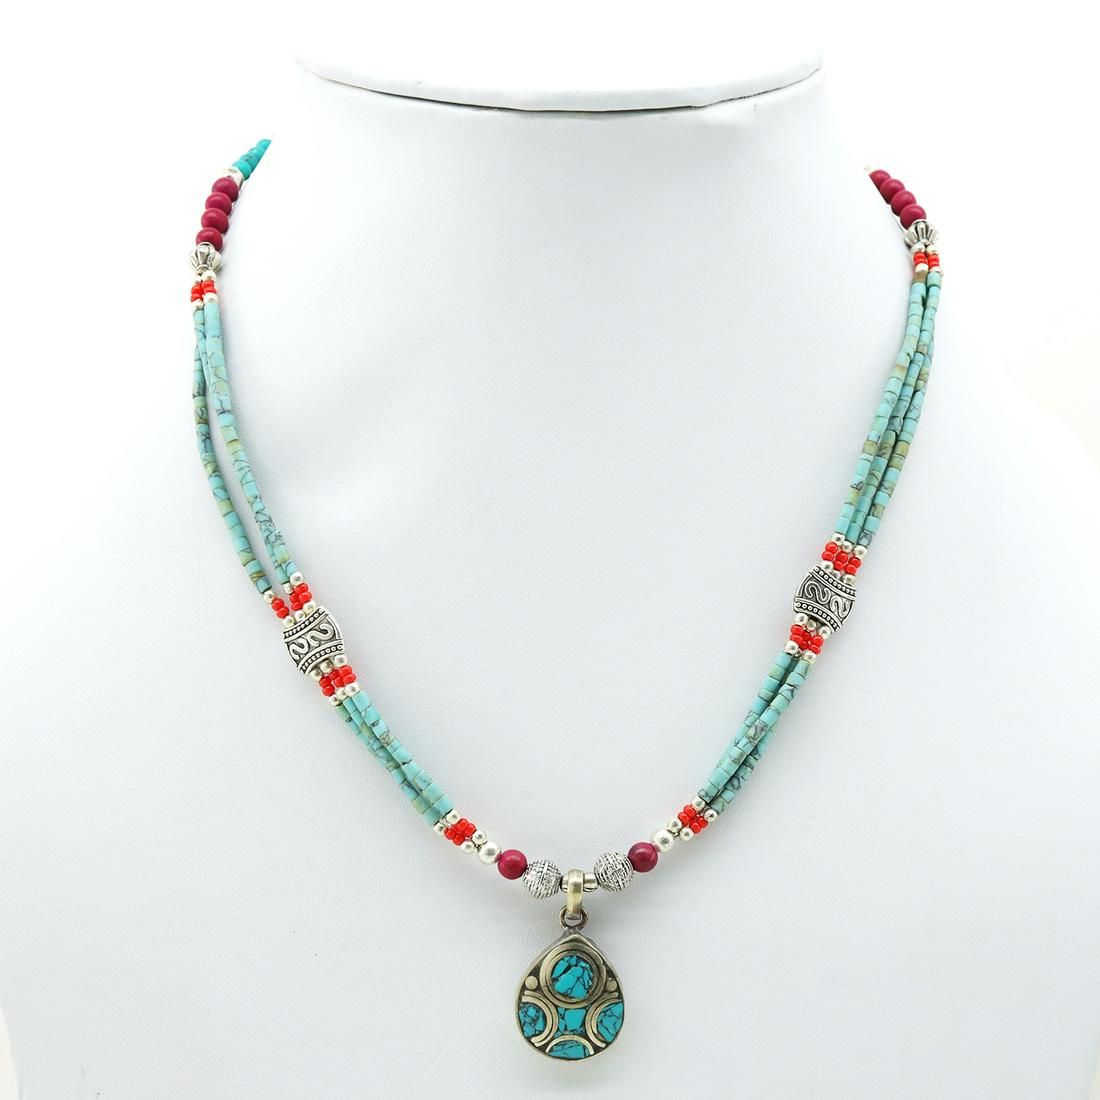 Tibetan Turquoise & Coral Beaded Pendant Necklace